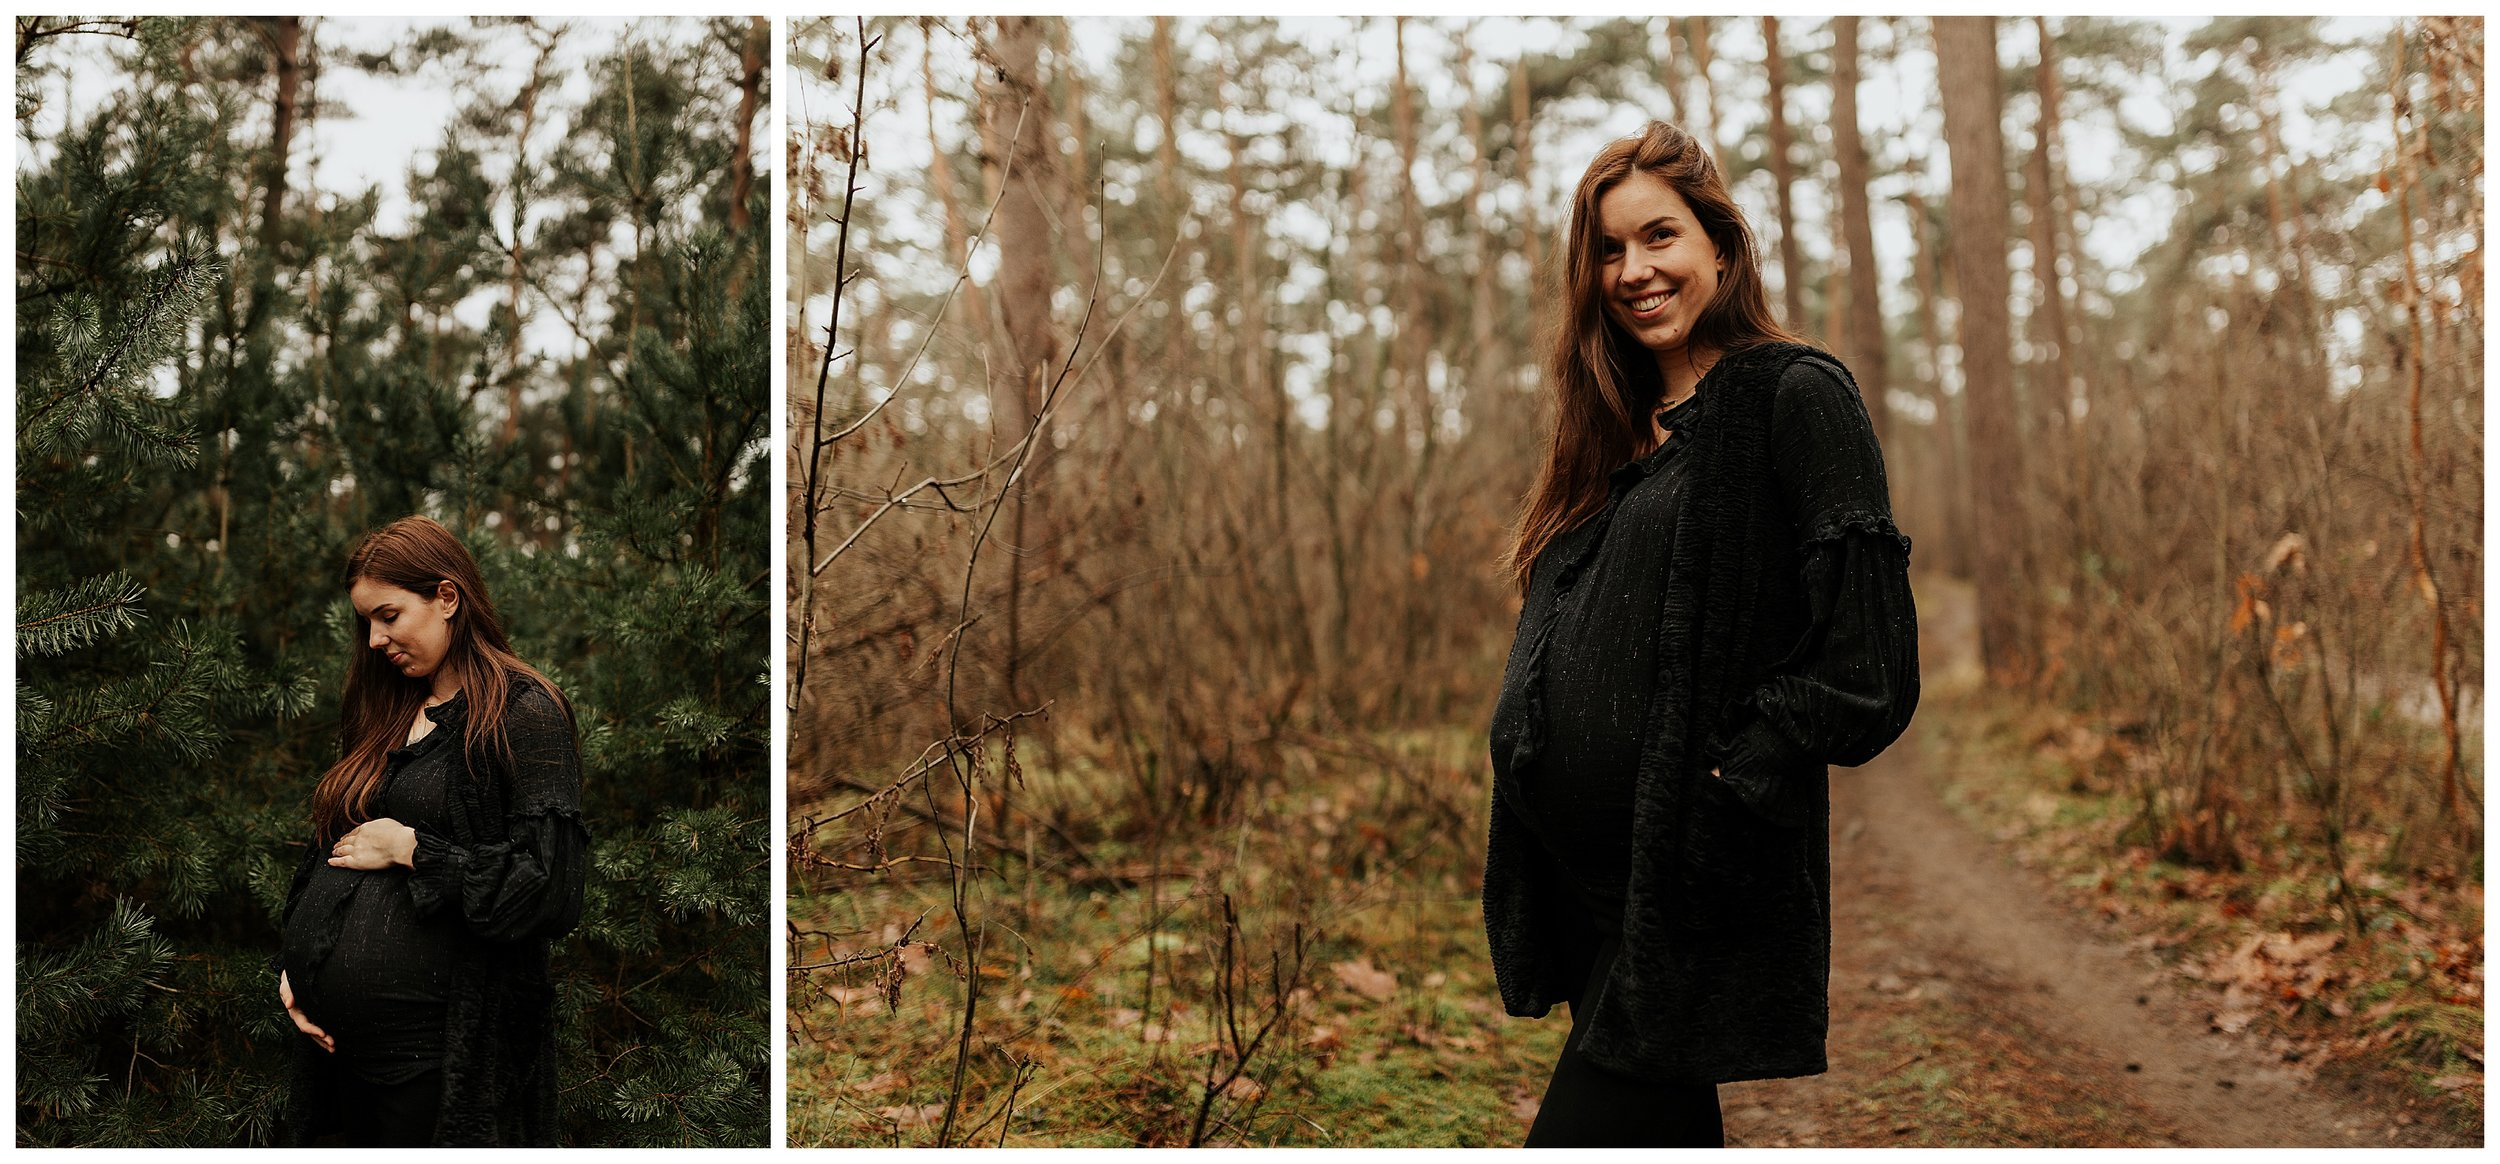 zwangerschapsfotografie-michelle-lisa-helsen-zwangerschapsfotograaf-zwangerschapsfoto-kempen-herentals-antwerpen-bohemian-boho_0005.jpg